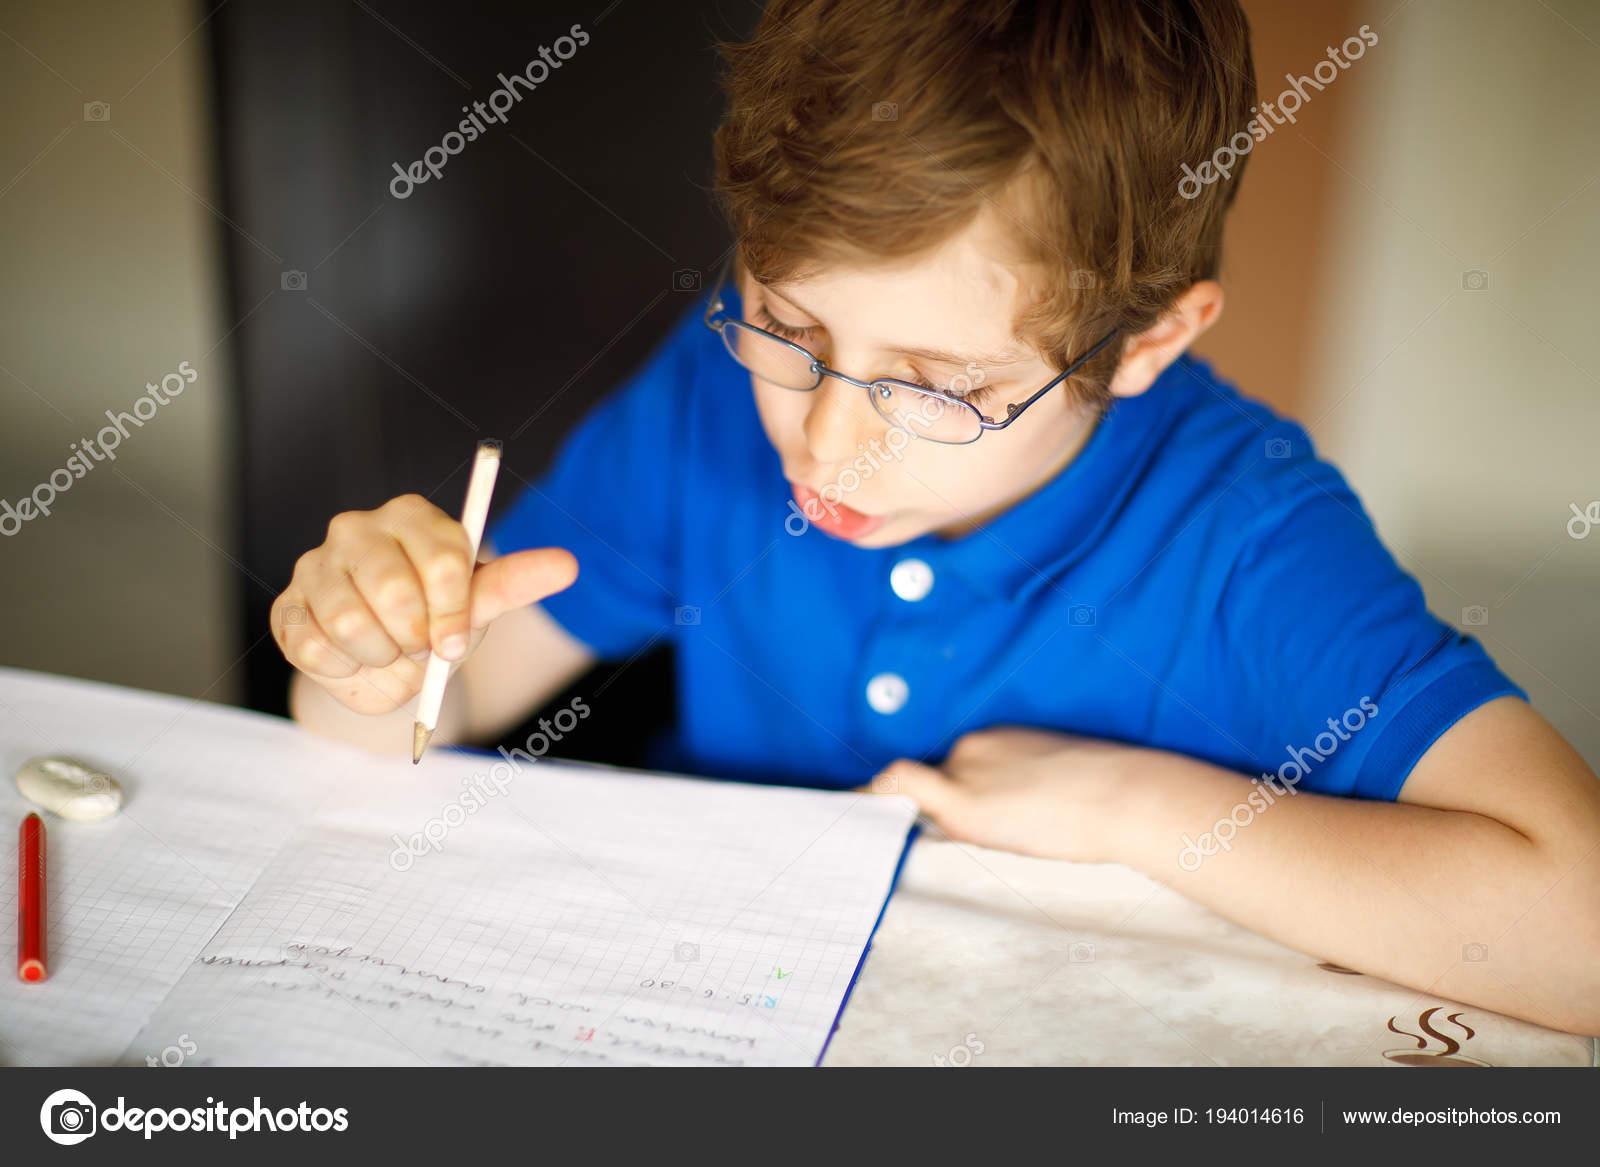 0cbf4f27935 Cute little kid boy with glasses at home making homework